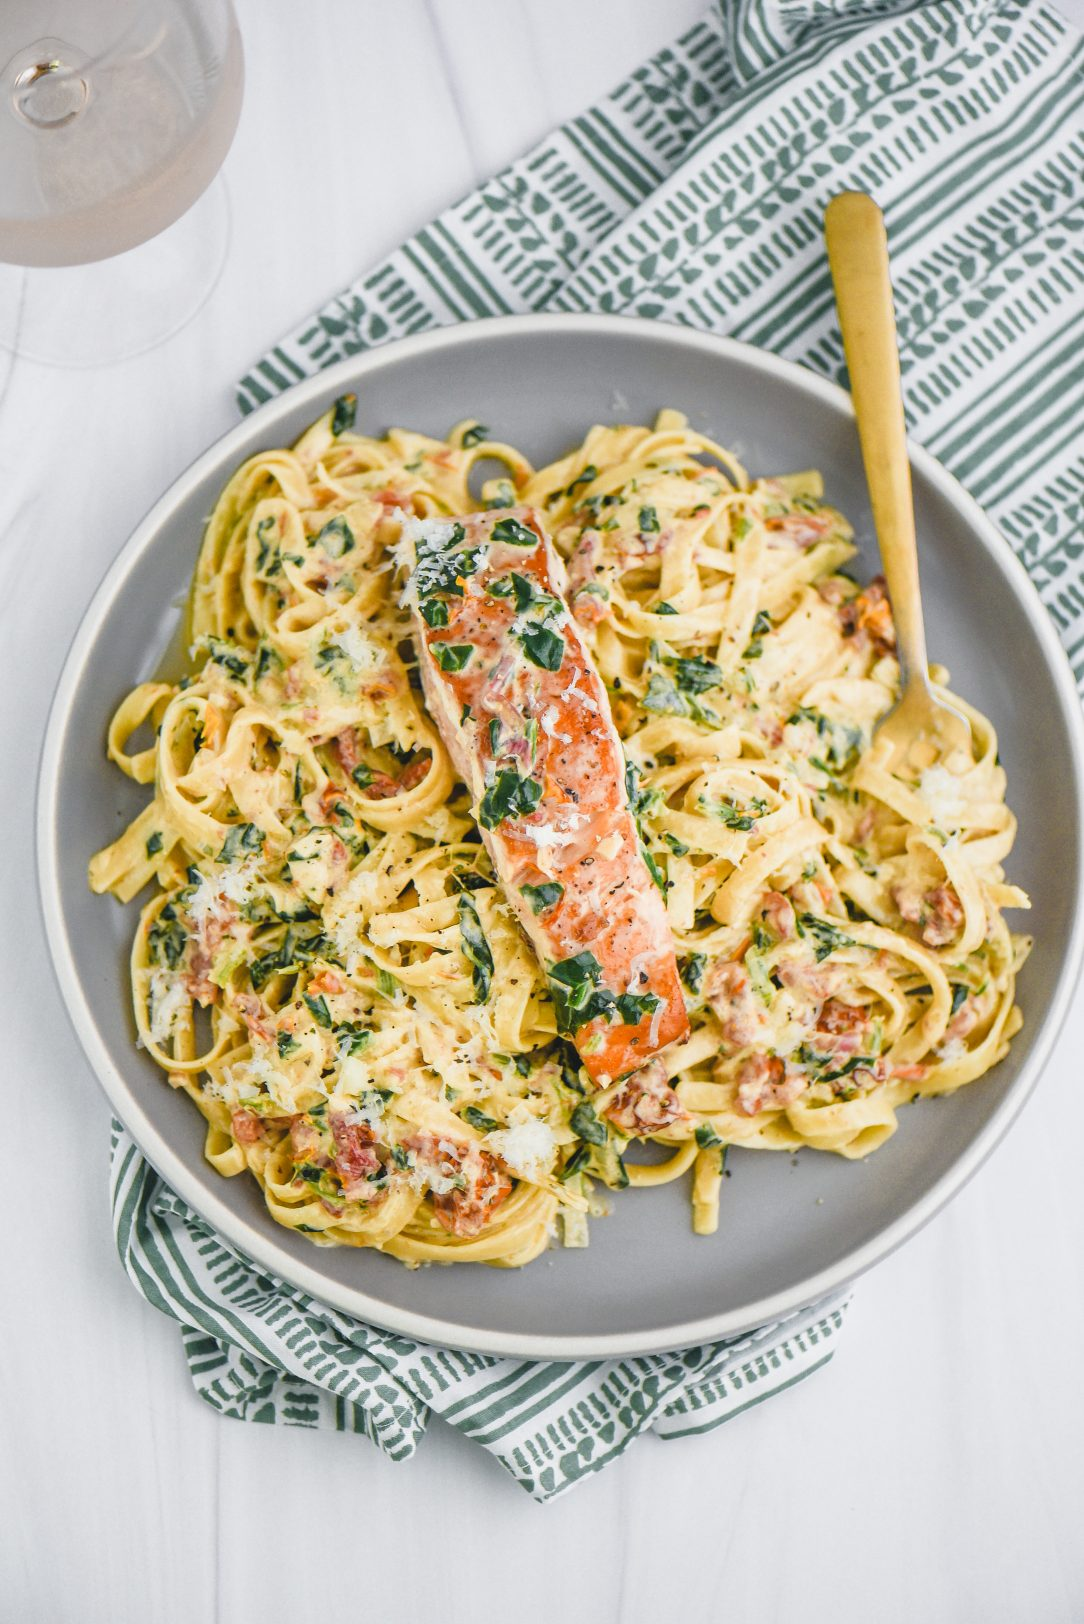 Tuscan Salmon Fettuccine Alfredo on a plate